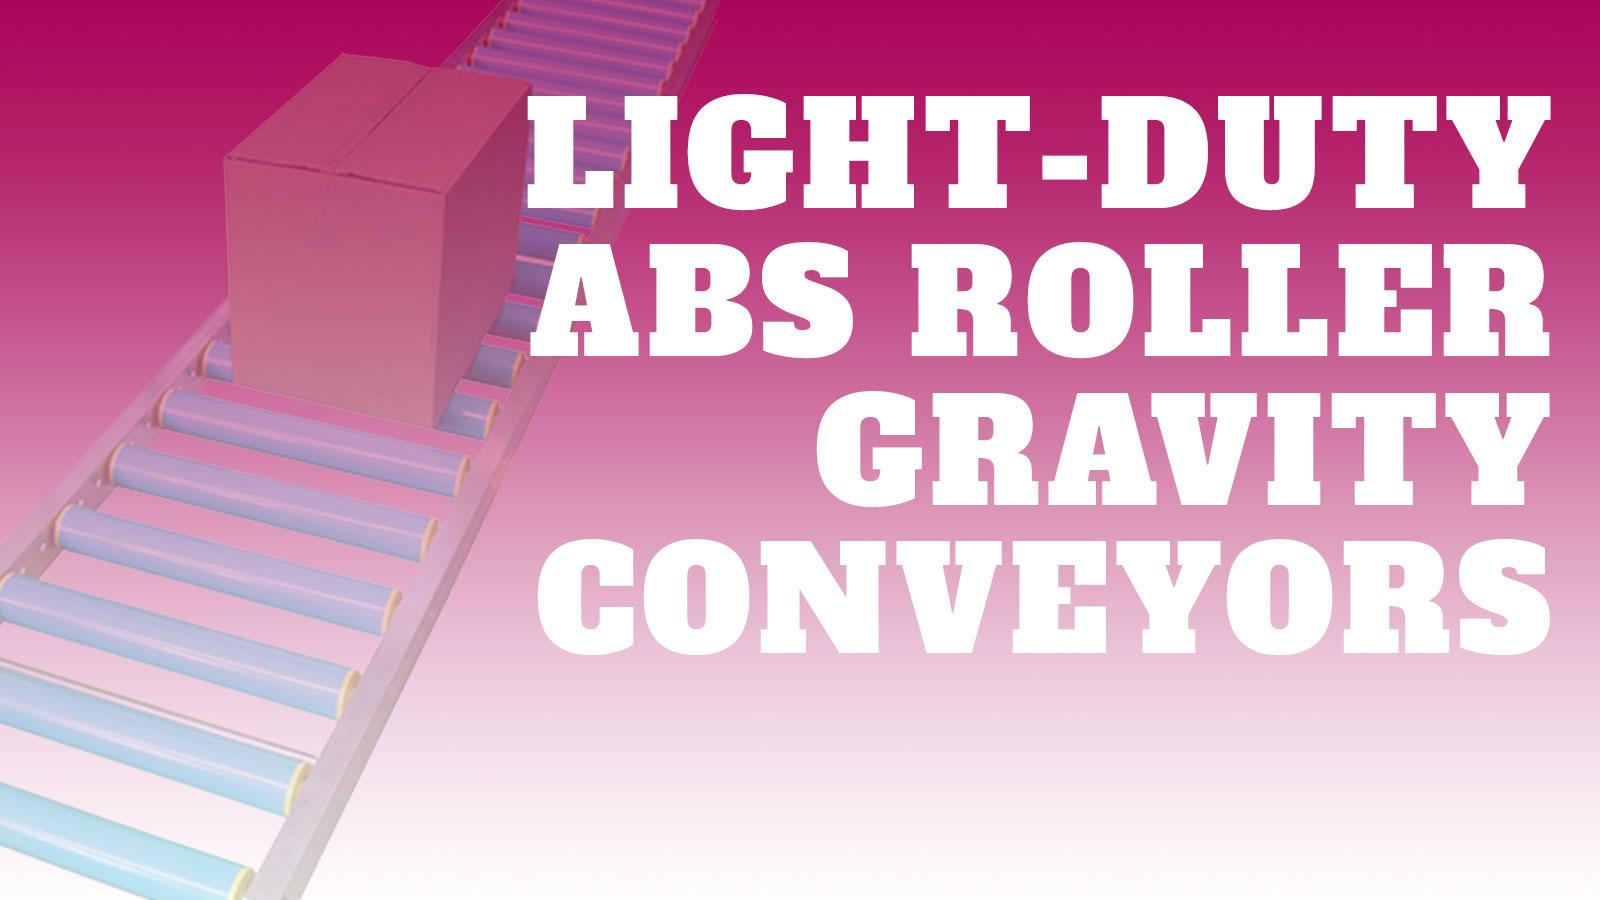 Conveyor-Light-Duty-ABS-Rollers